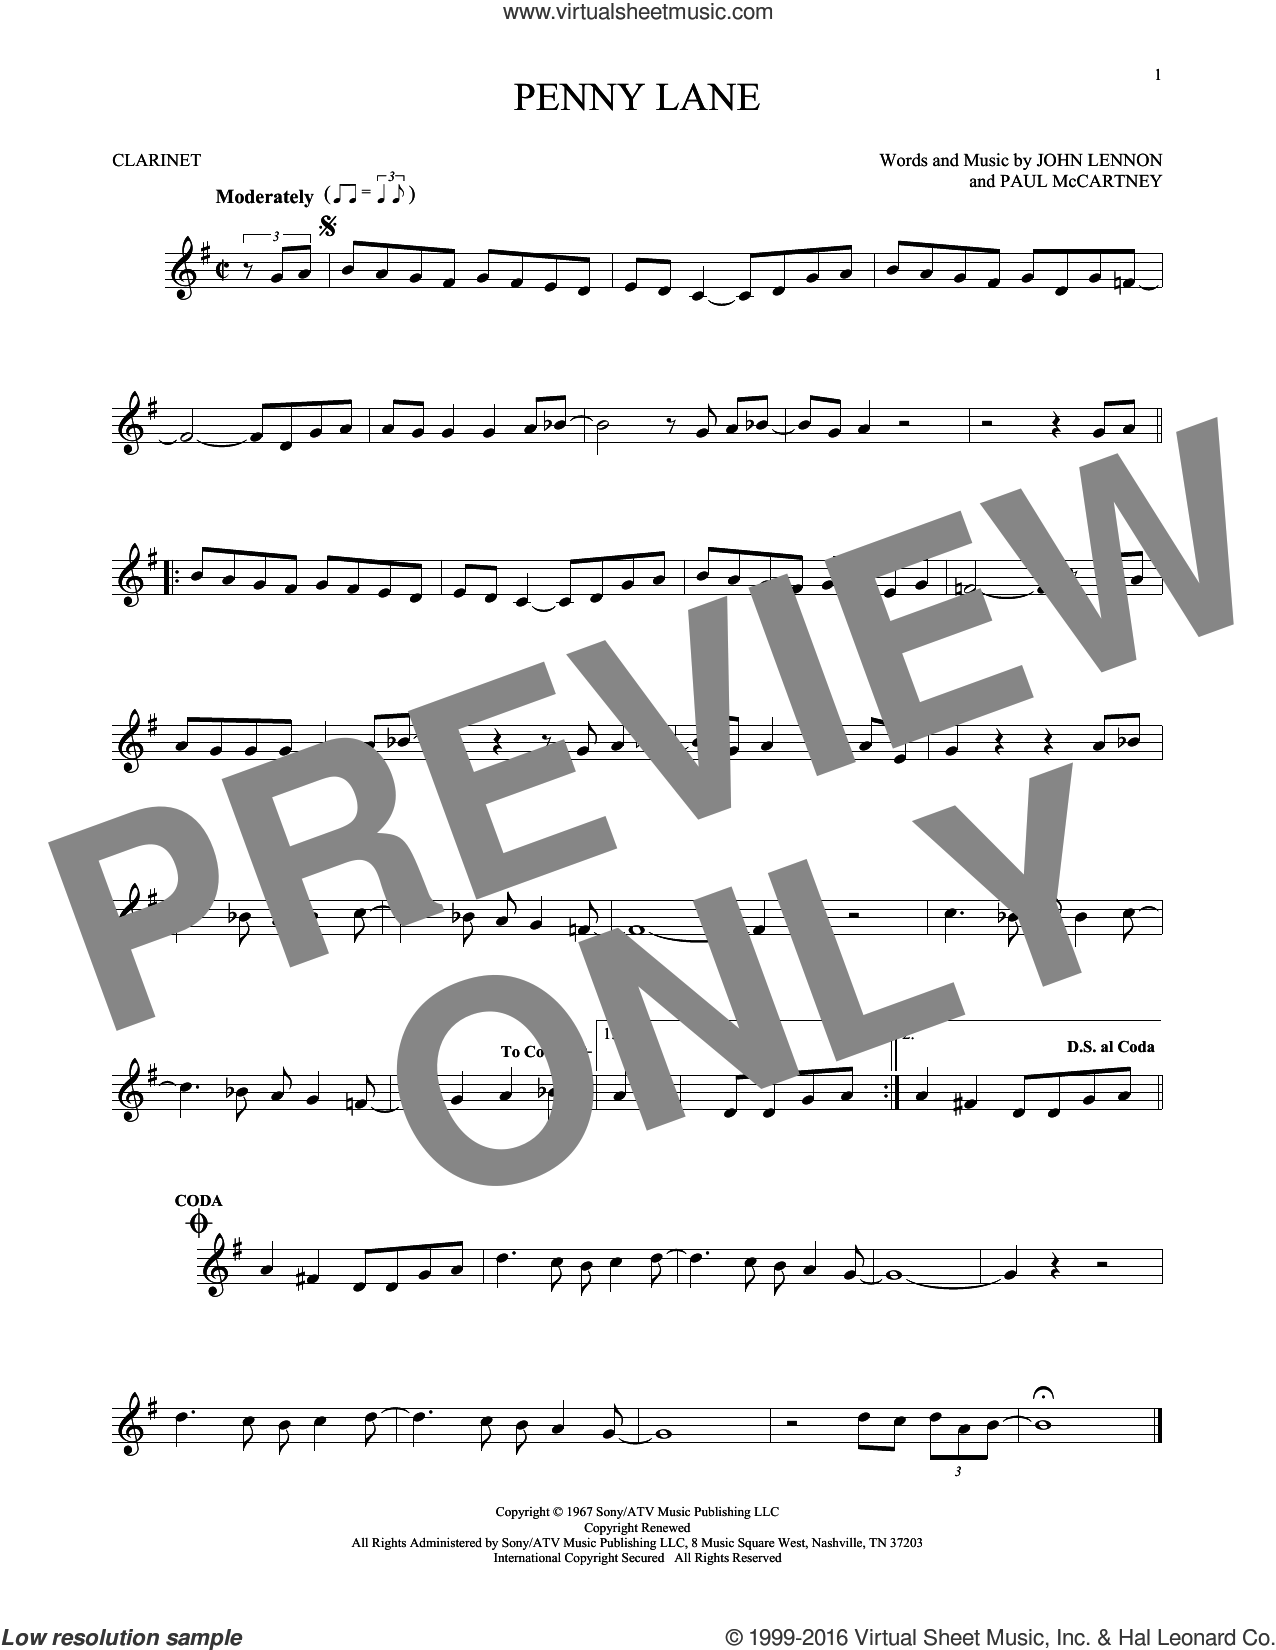 Penny Lane sheet music for clarinet solo by The Beatles, John Lennon and Paul McCartney, intermediate skill level